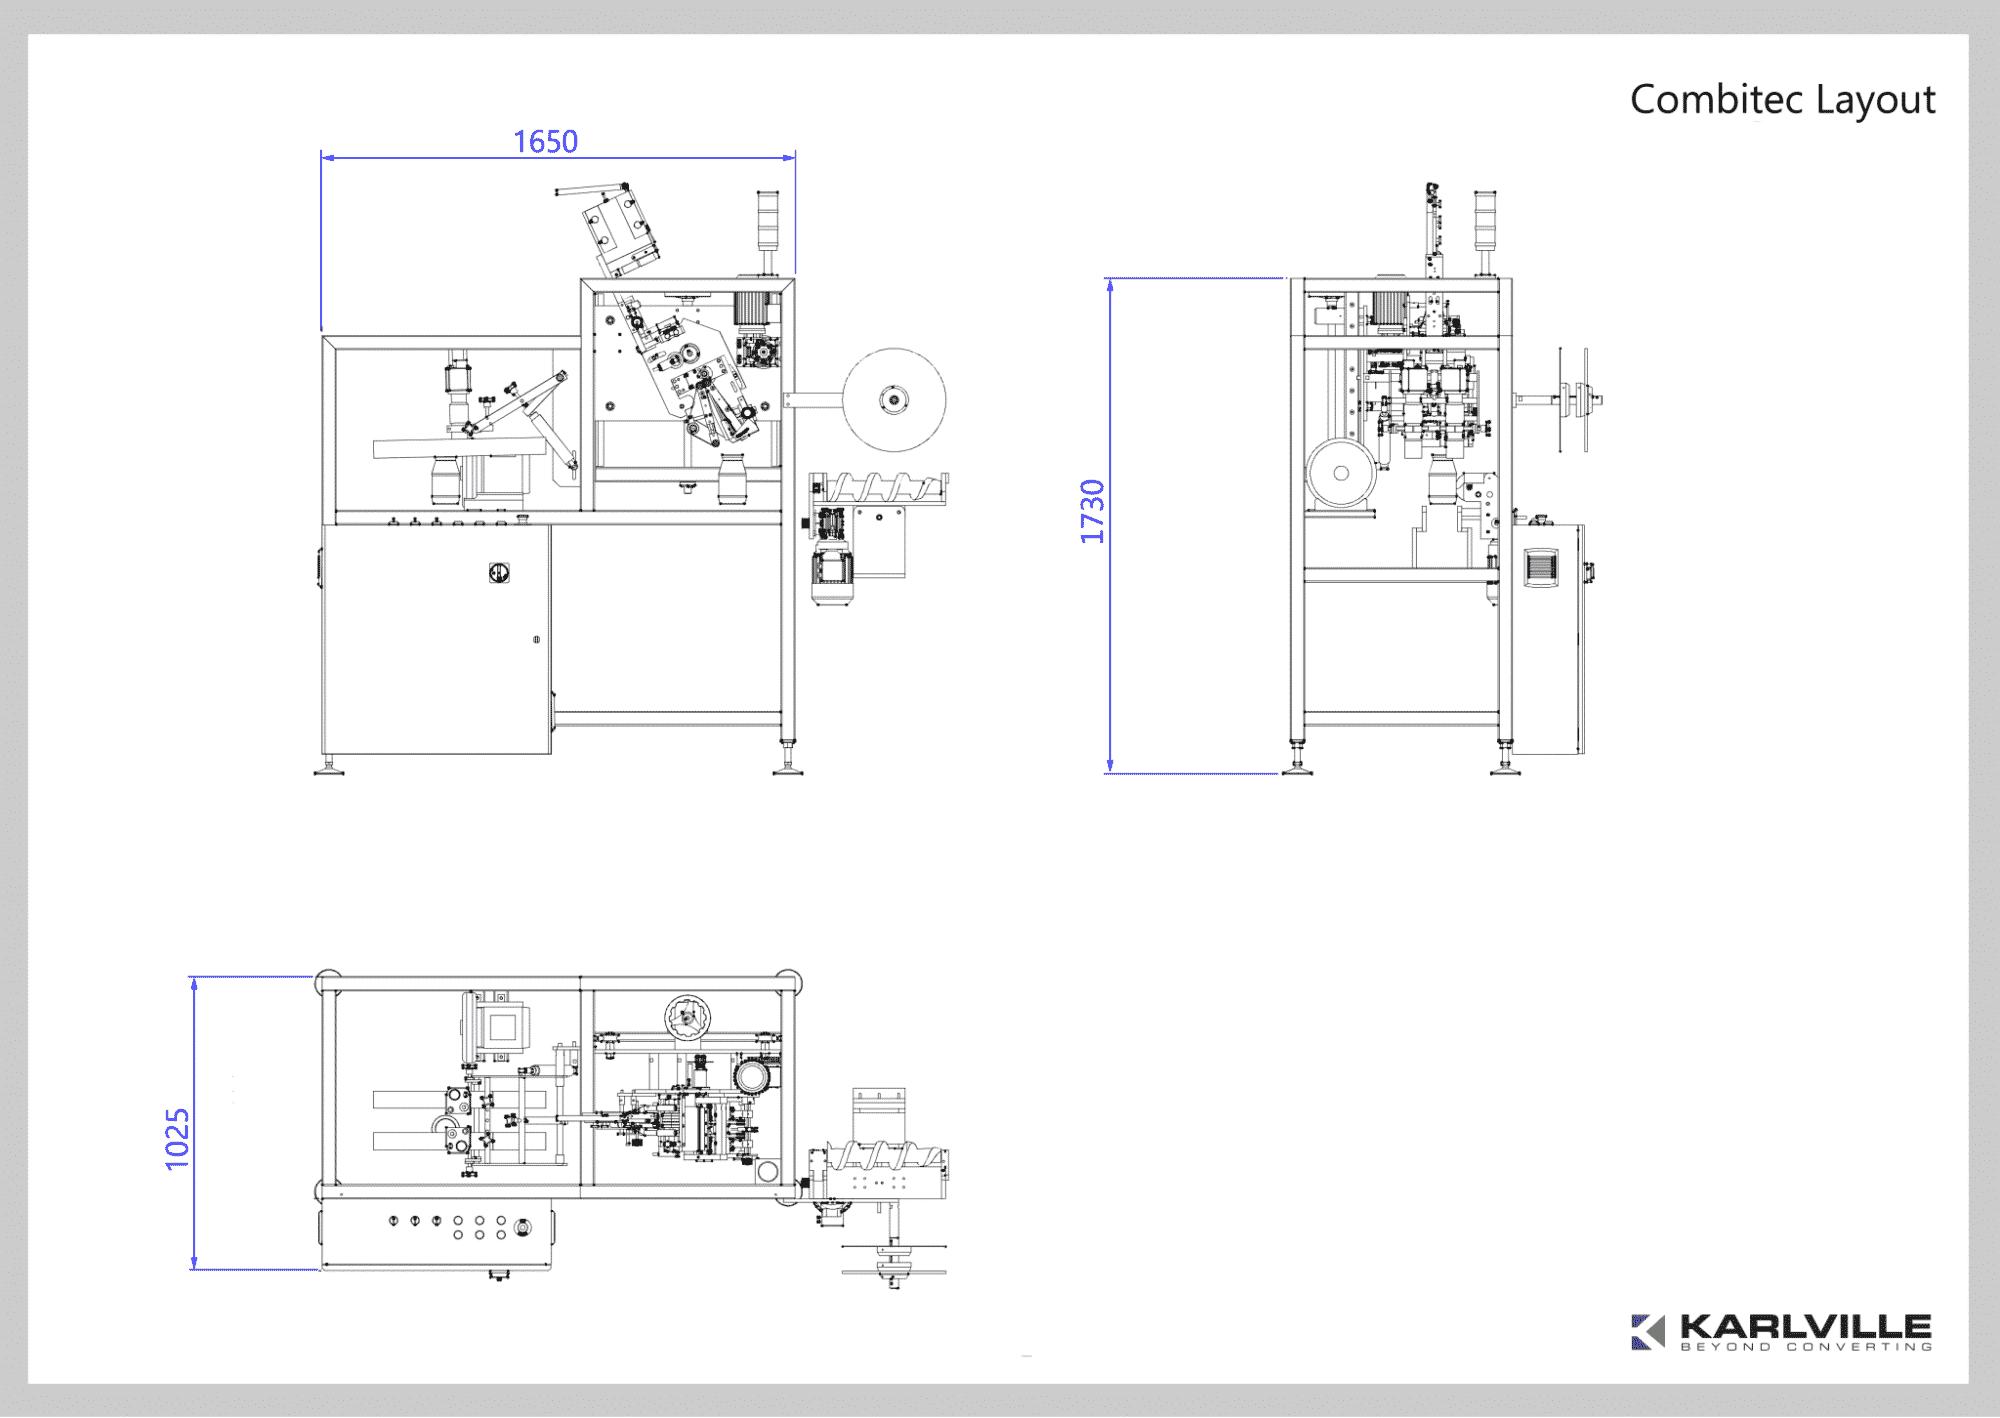 Combitec-1.png (2048×1452)